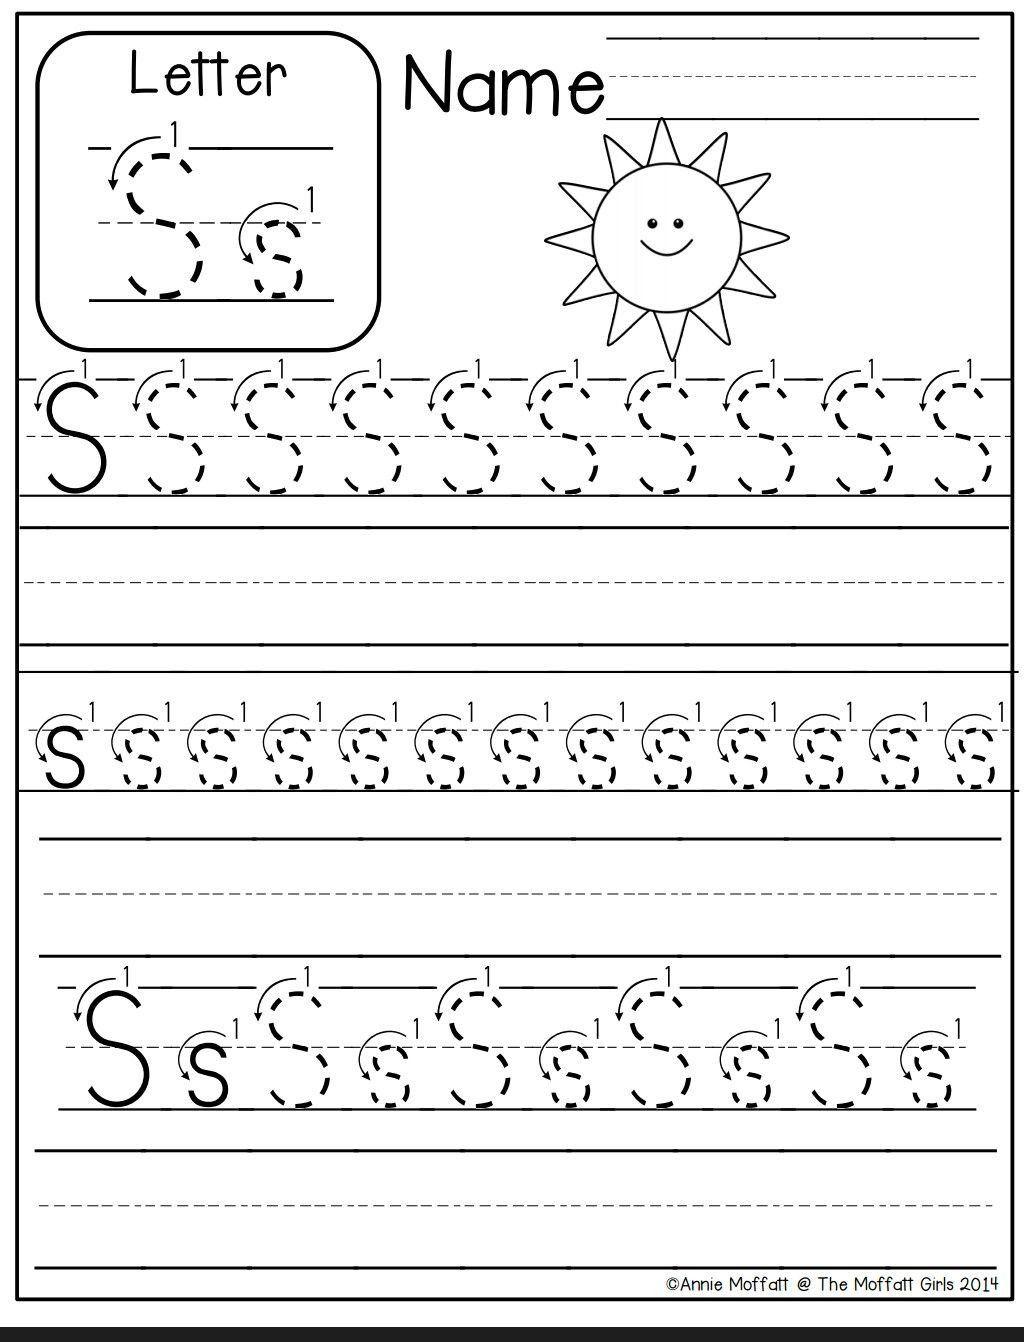 Writing Worksheets For Preschoolers Math Worksheet Incredible P In 2020 Writing Worksheets Kindergarten Alphabet Worksheets Preschool Kindergarten Worksheets Printable